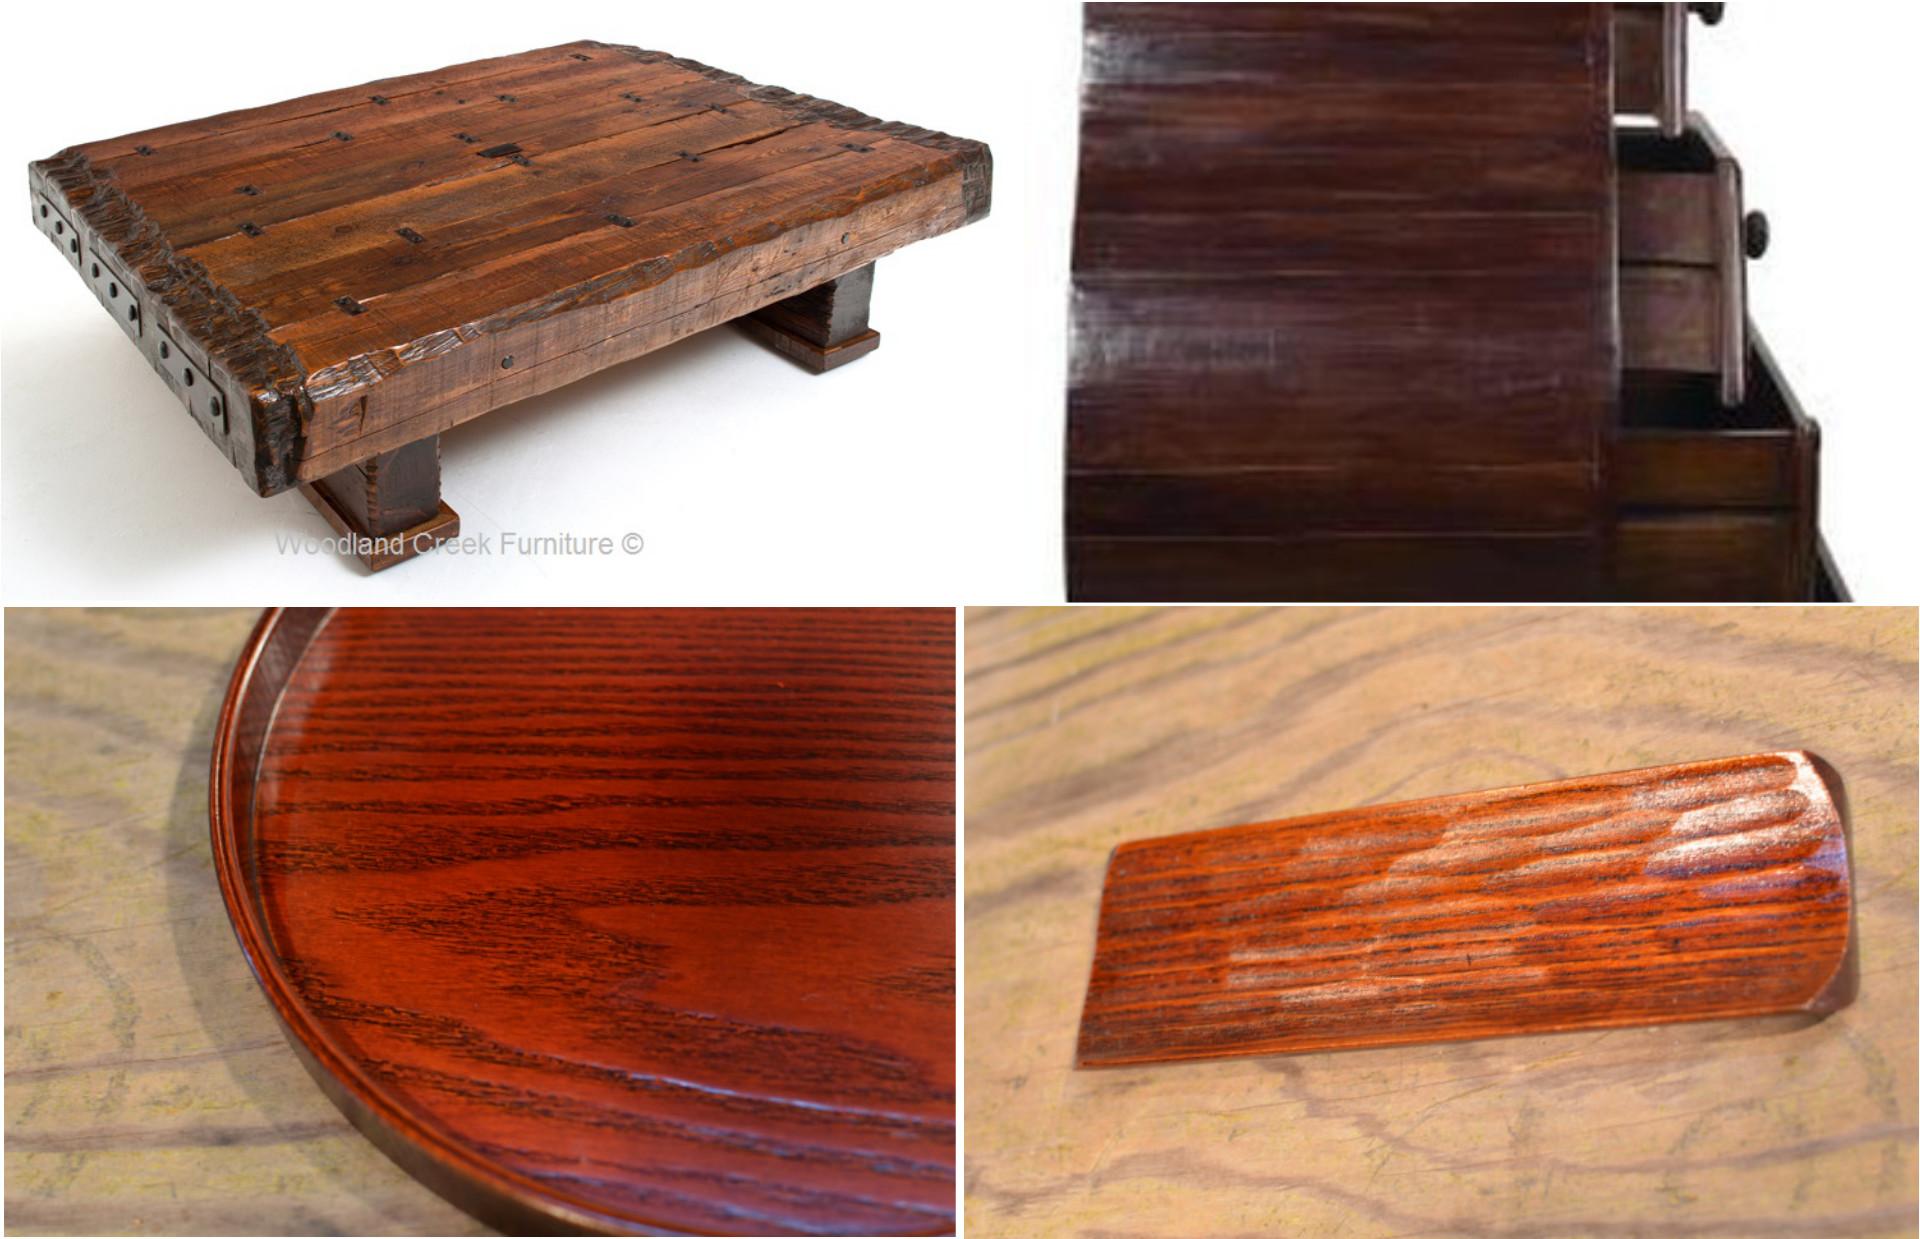 Fullsize Of Woodland Creek Furniture